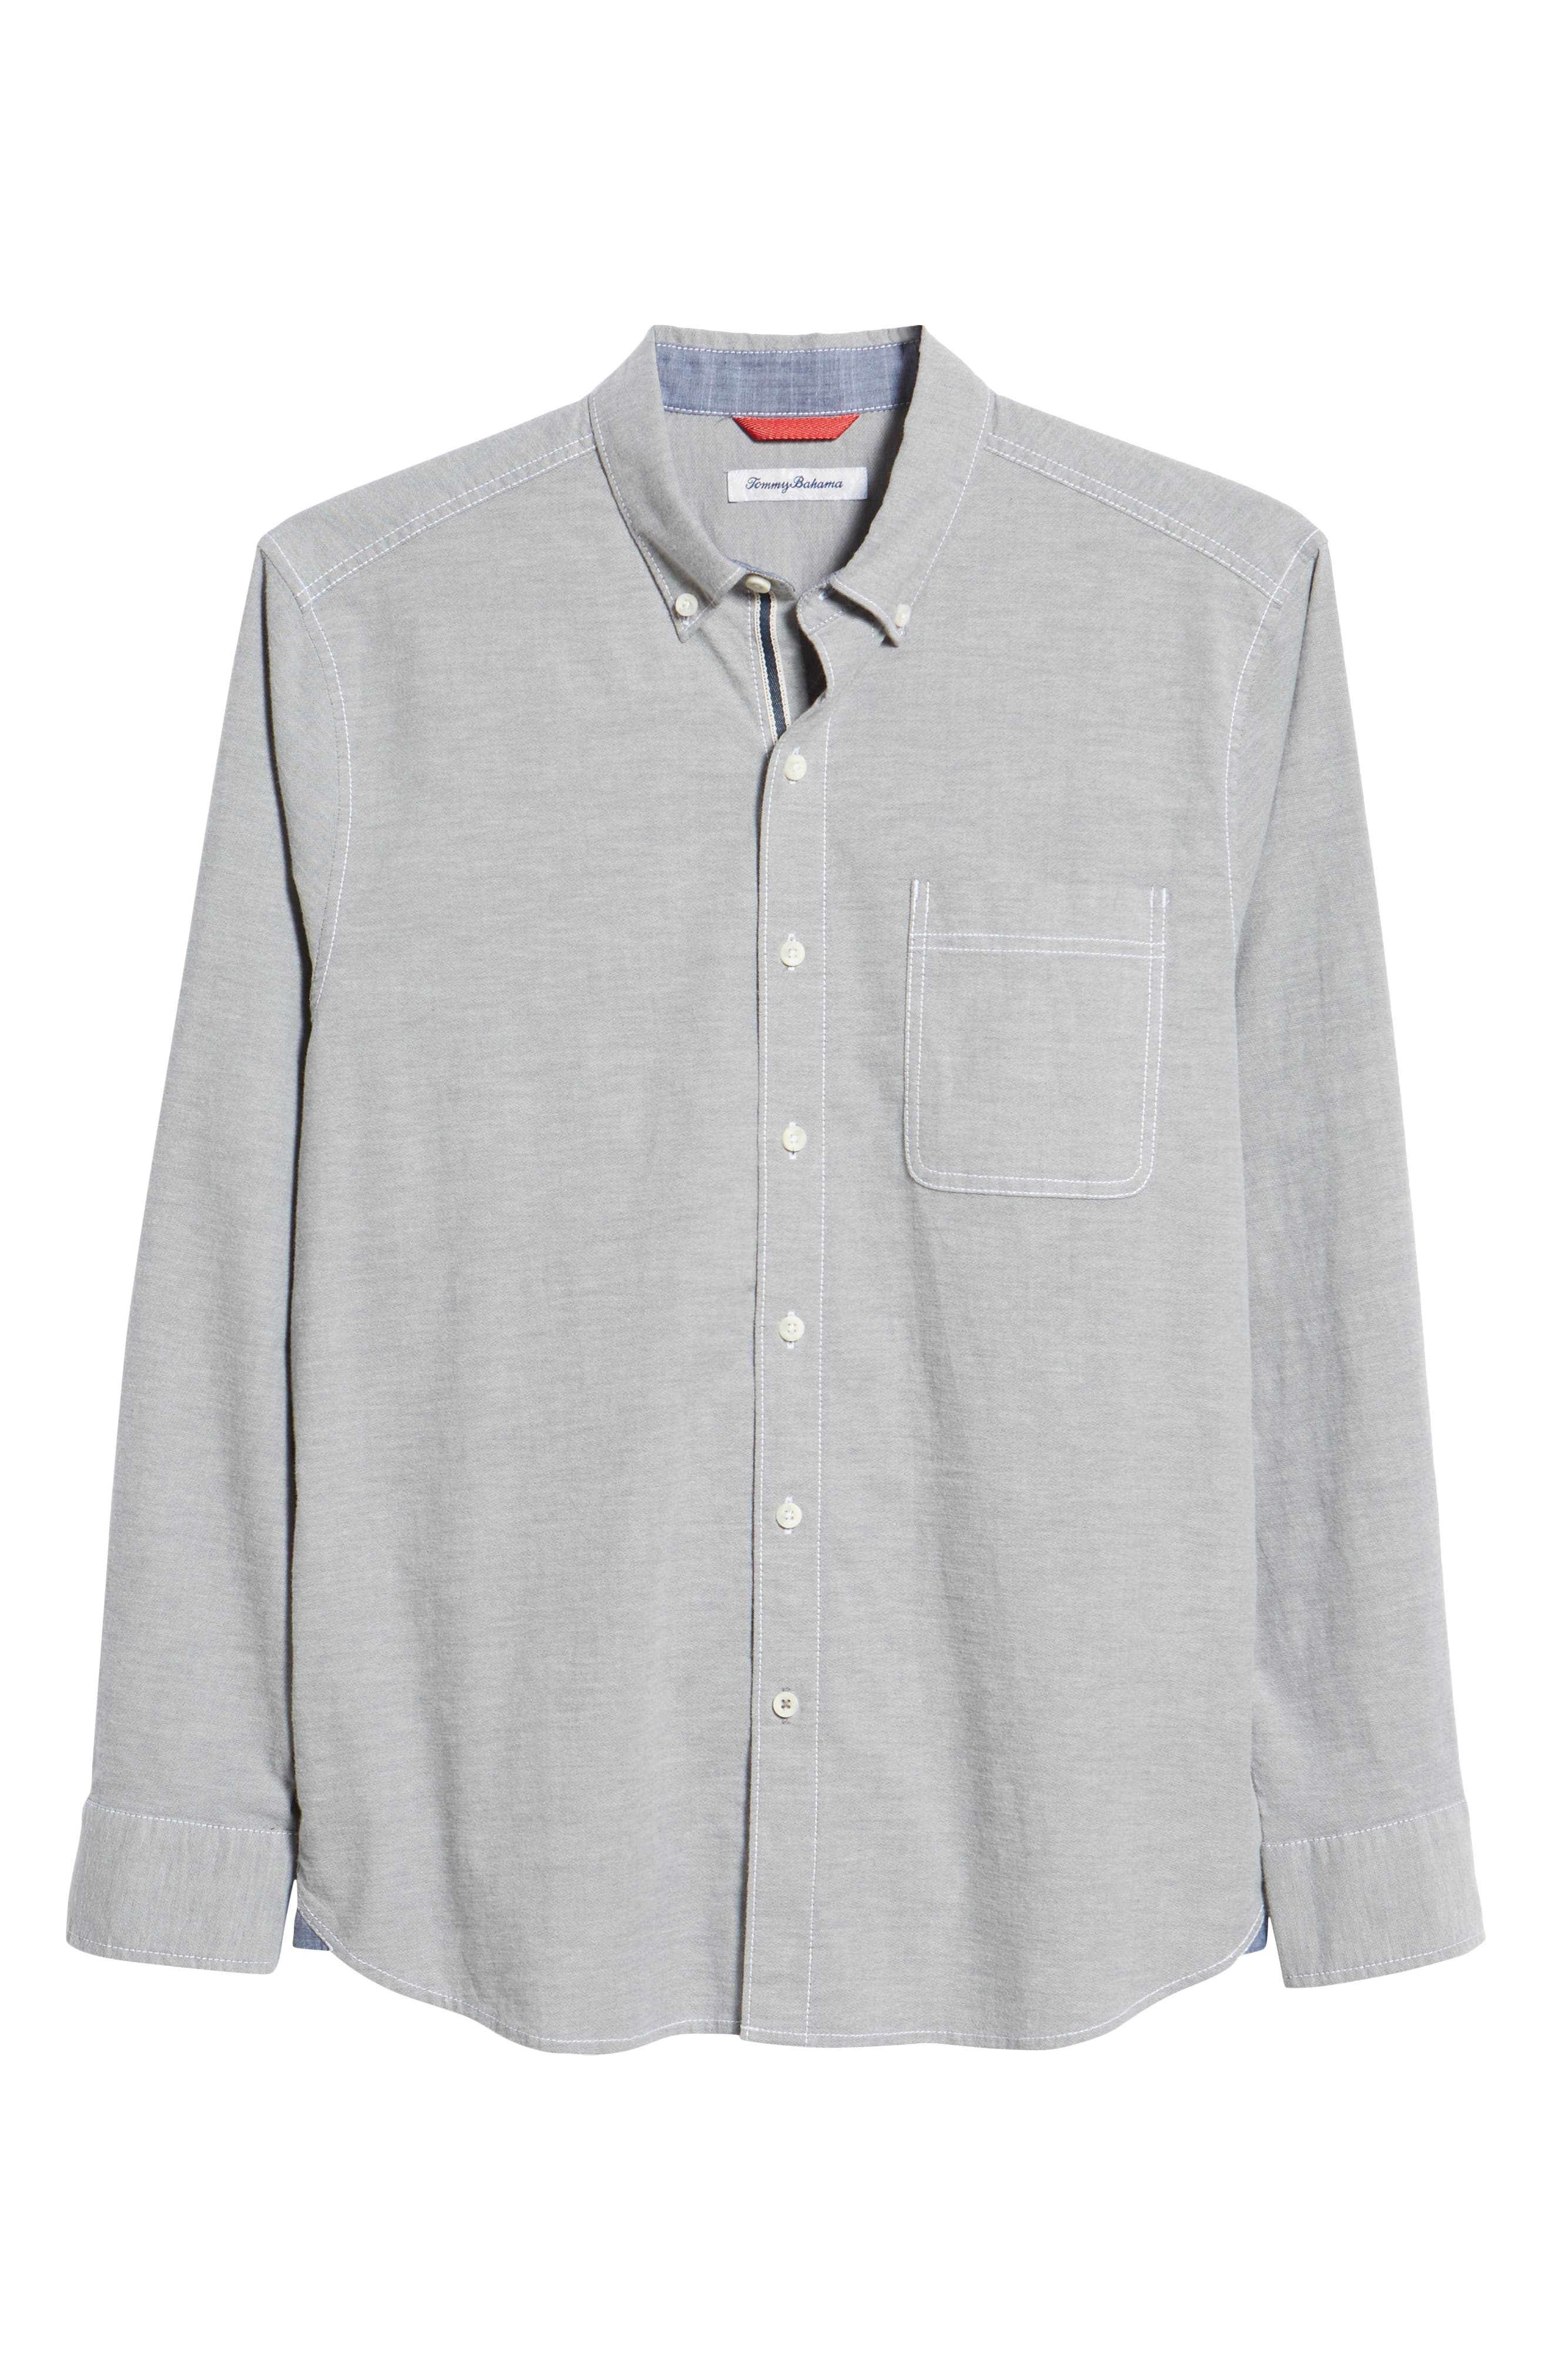 Oxford Isles Sport Shirt,                             Alternate thumbnail 5, color,                             001